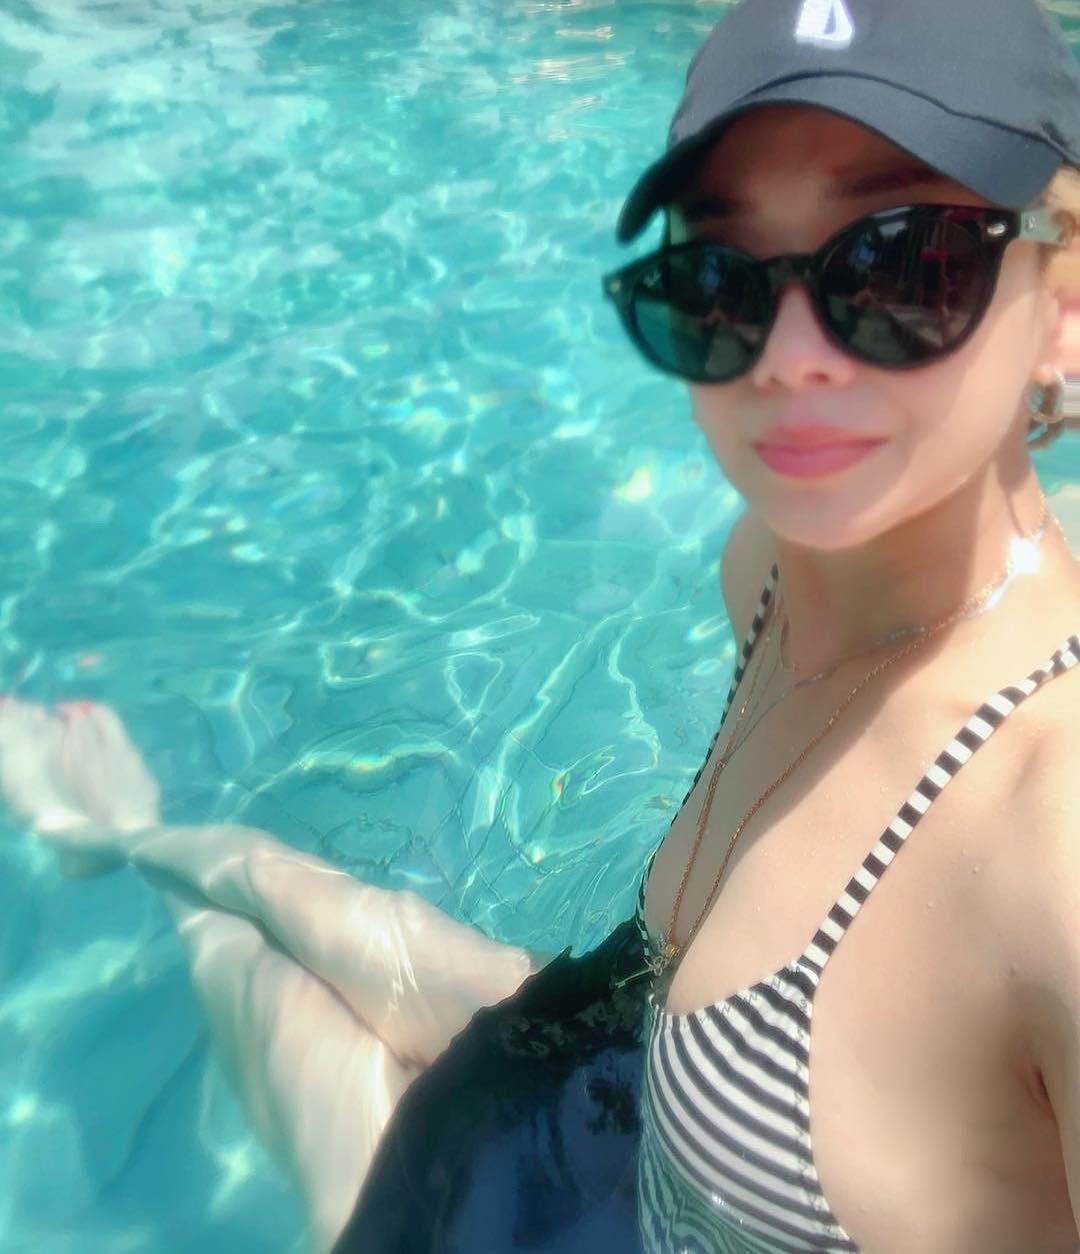 黃太亦在其IG貼出泳衣照。 kakainwonderland IG圖片